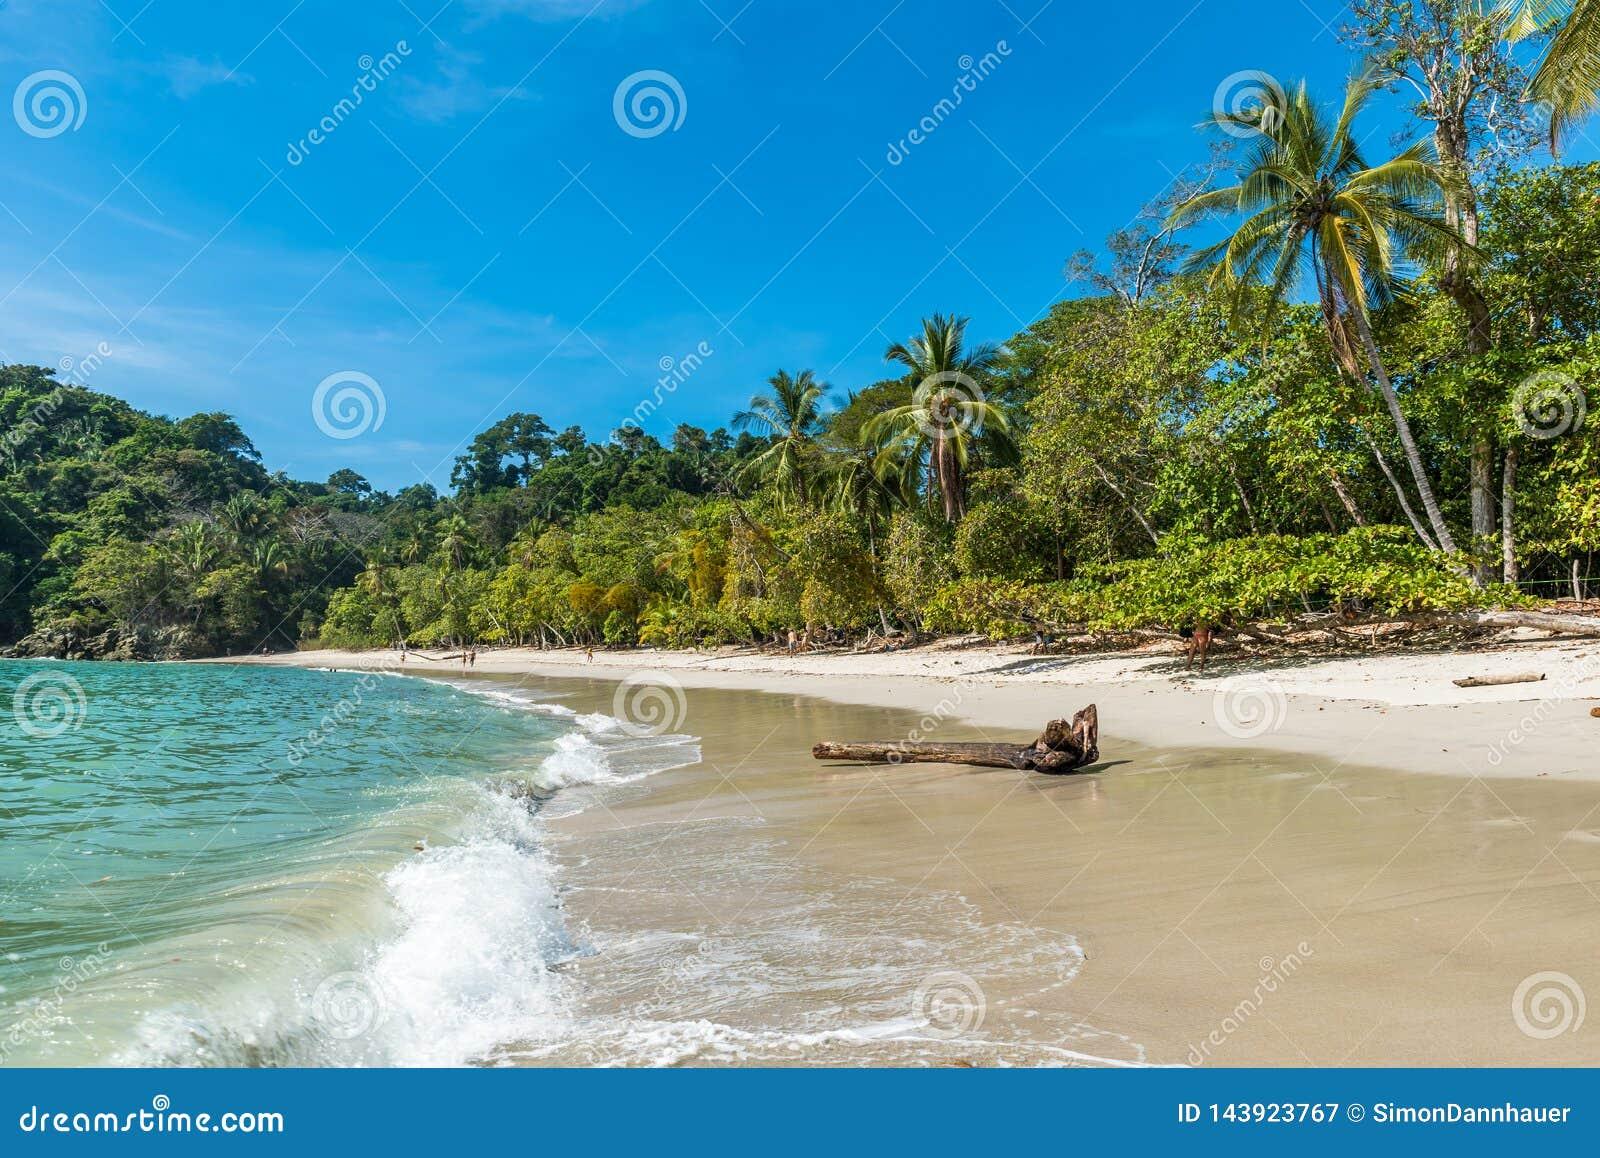 Manuel Antonio, Costa Rica - beautiful tropical beach